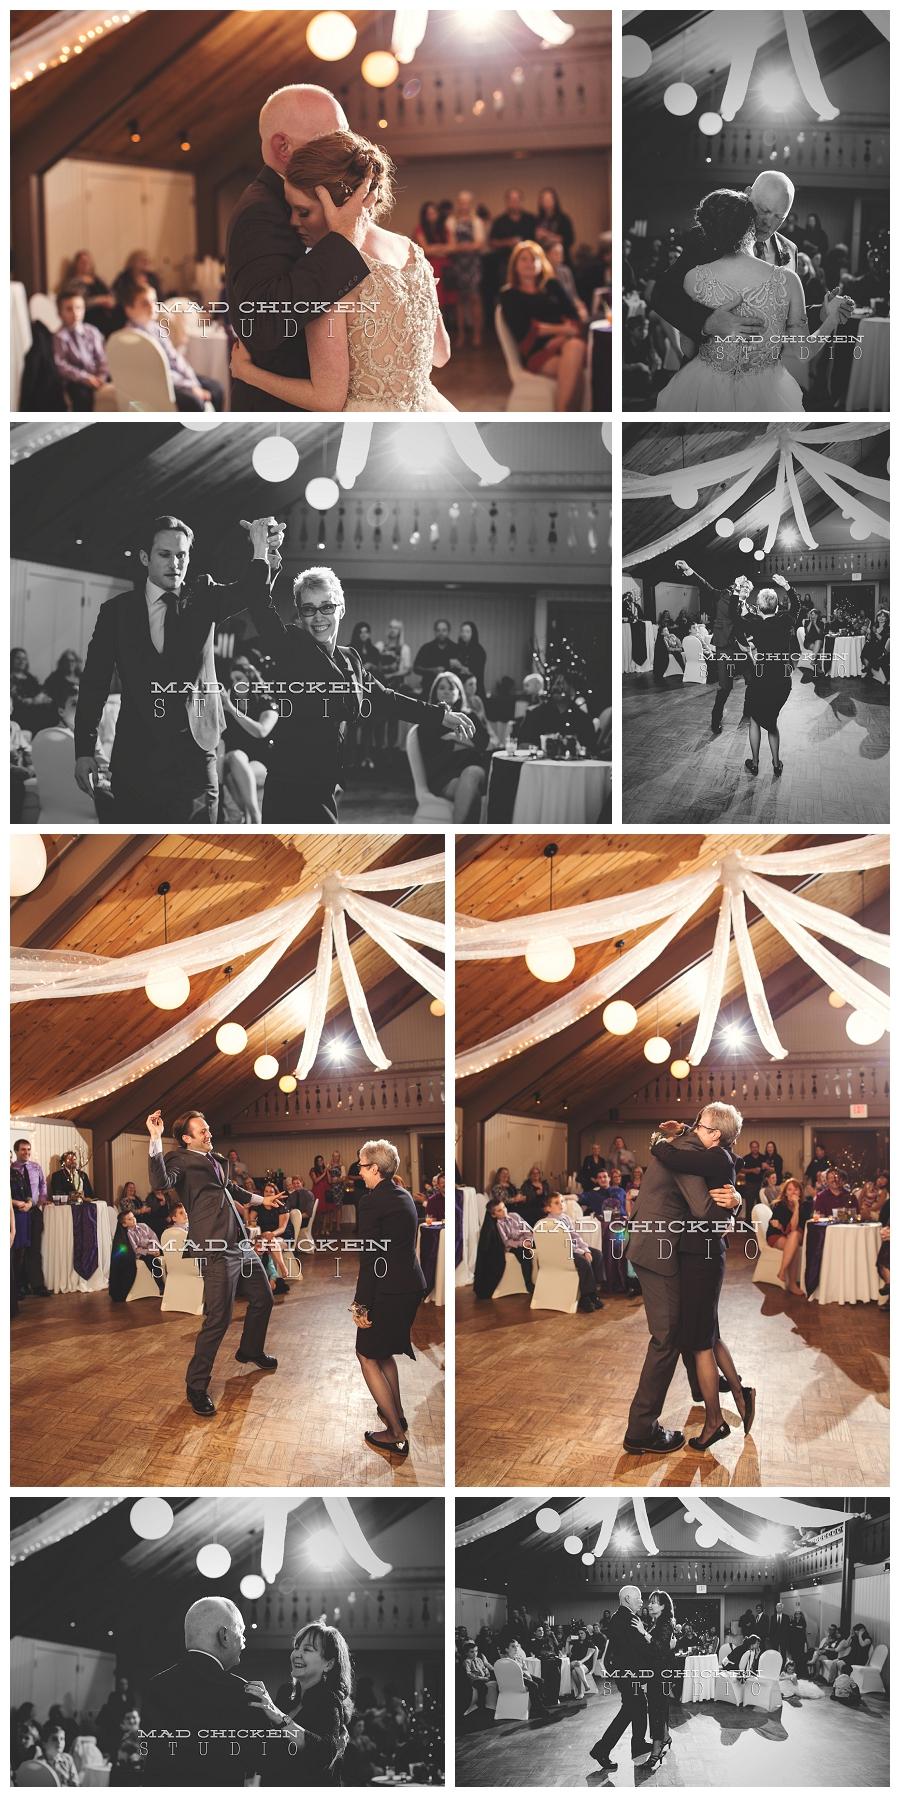 34 dancing photographed by mad chicken studio in lutsen mn.jpg